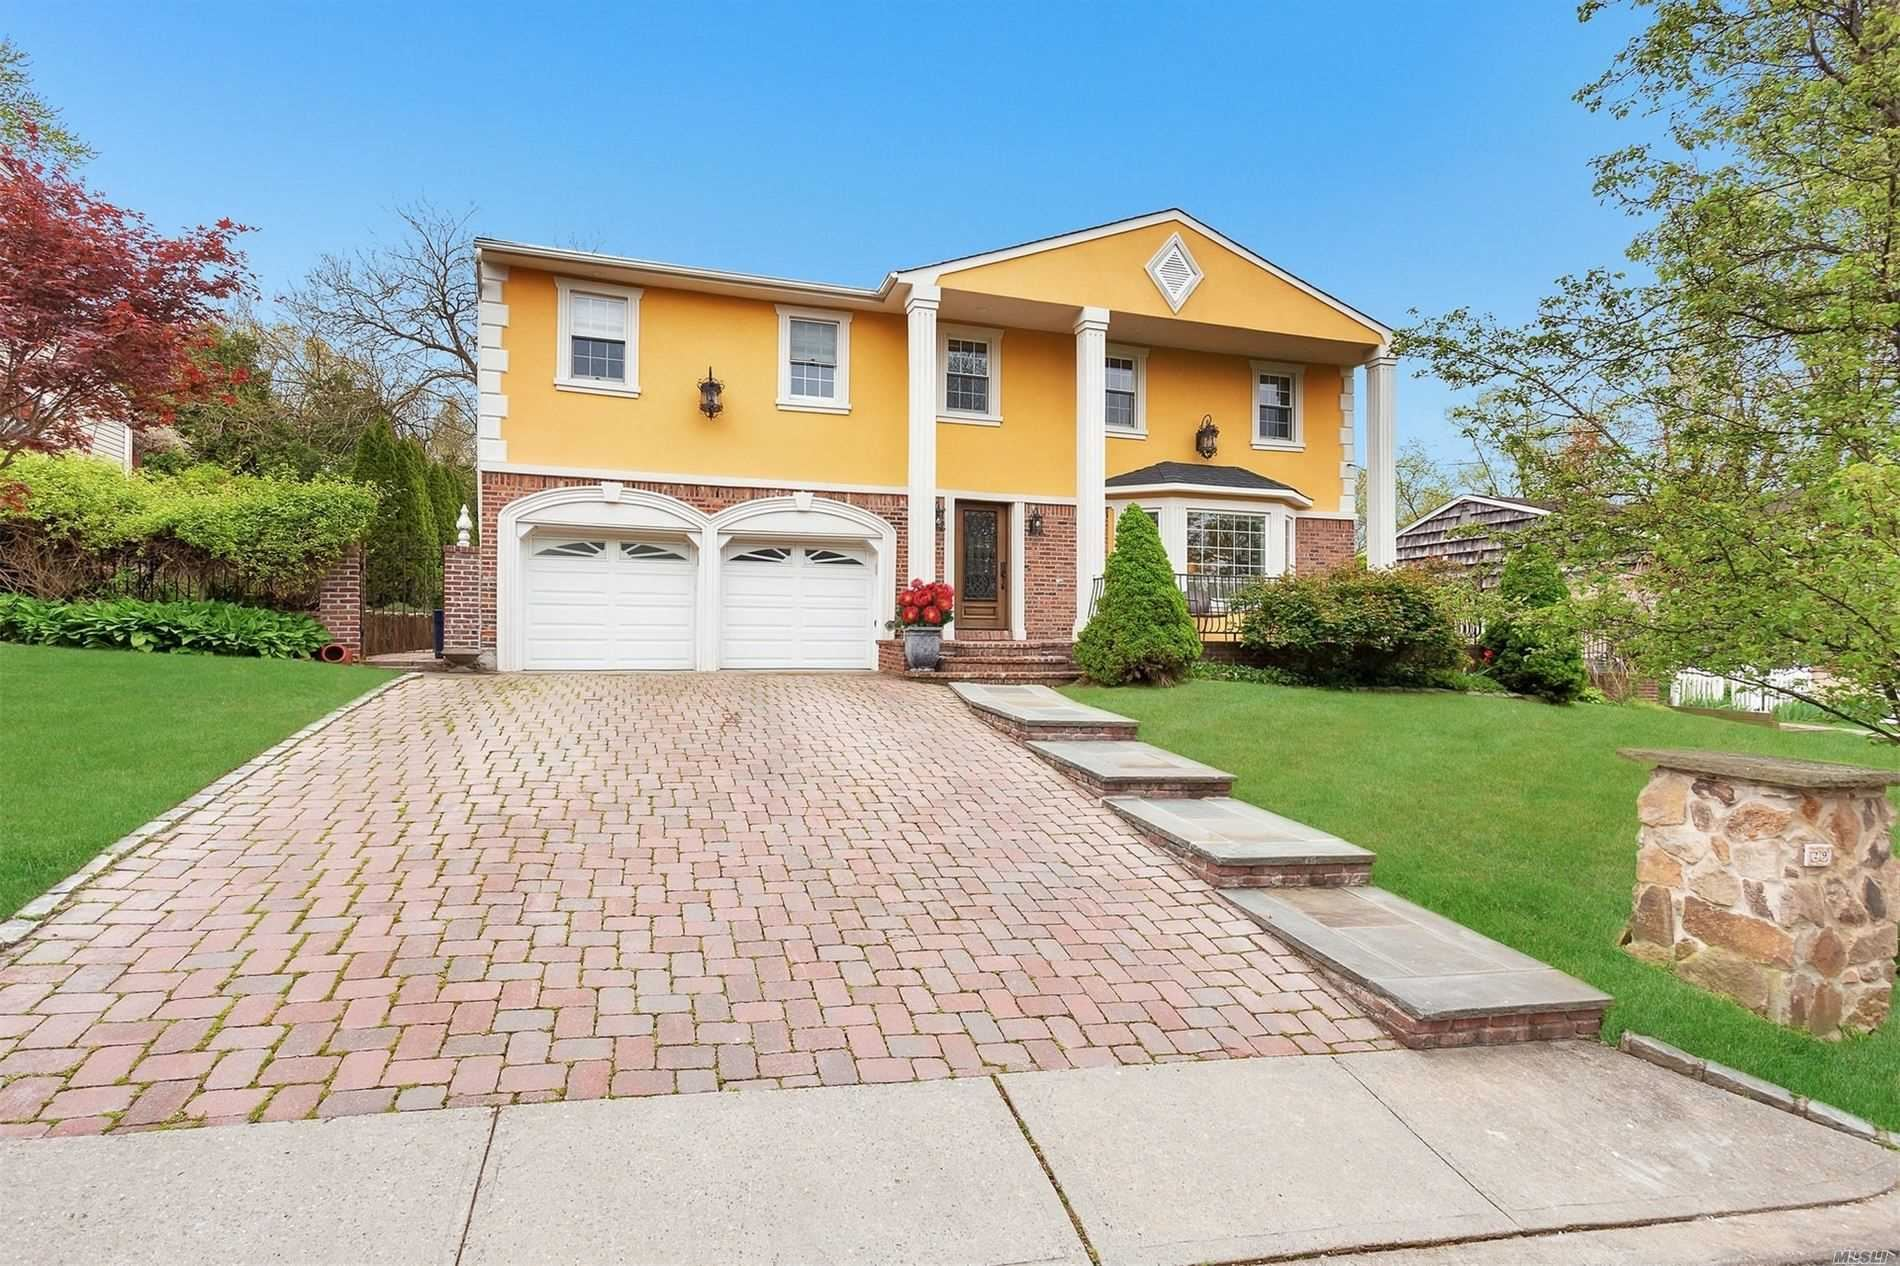 29 Vine Street, Roslyn Harbor, NY 11576 - MLS#: 3214505